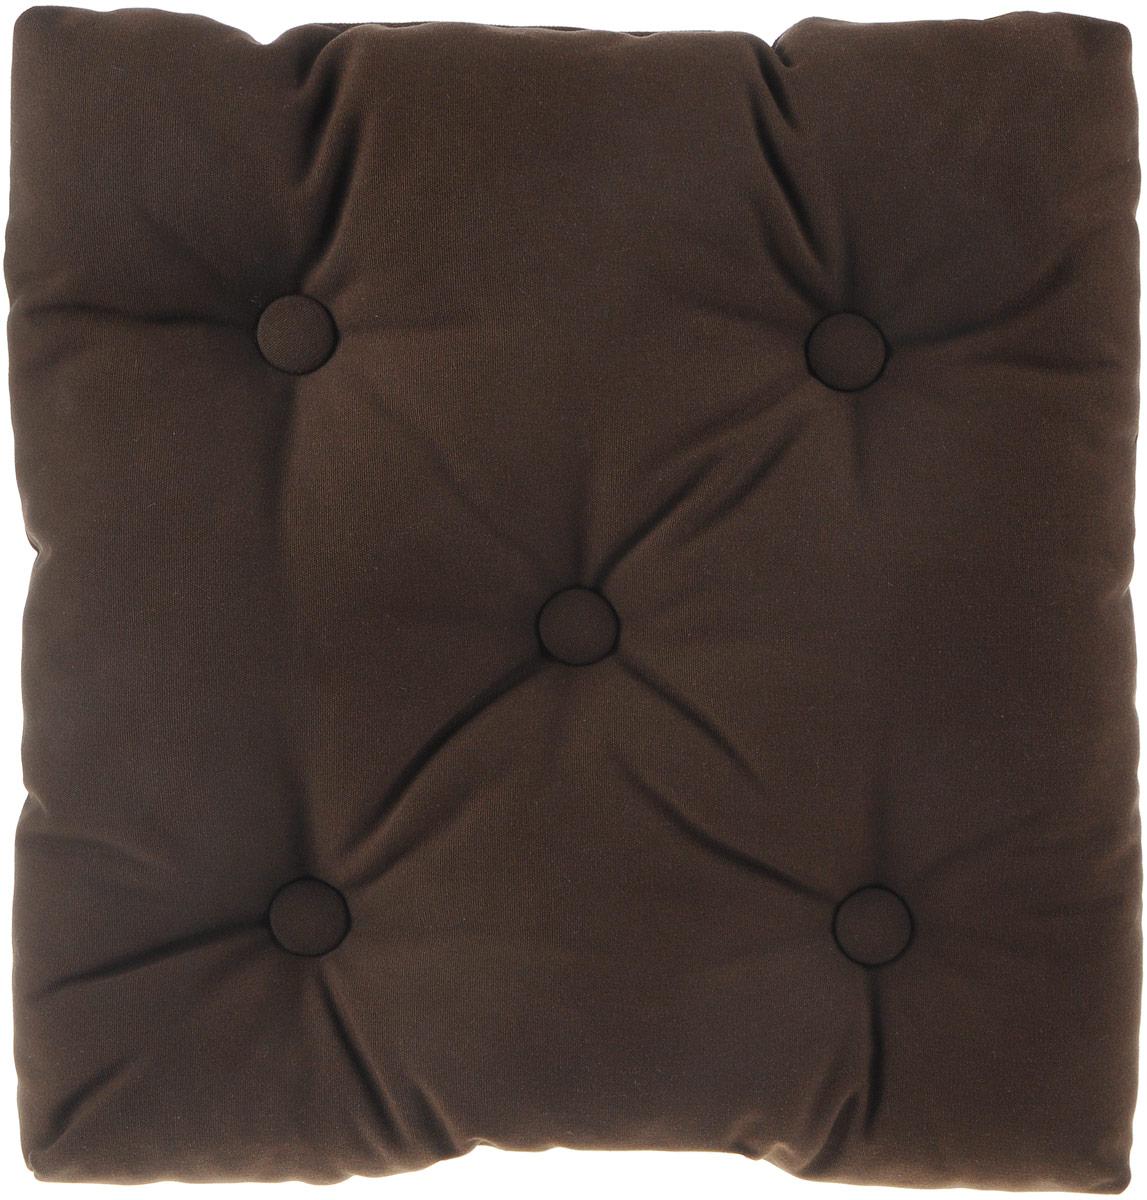 Подушка на стул KauffOrt Сад, цвет: коричневый, 40 x 40 см подушка на стул kauffort barolo